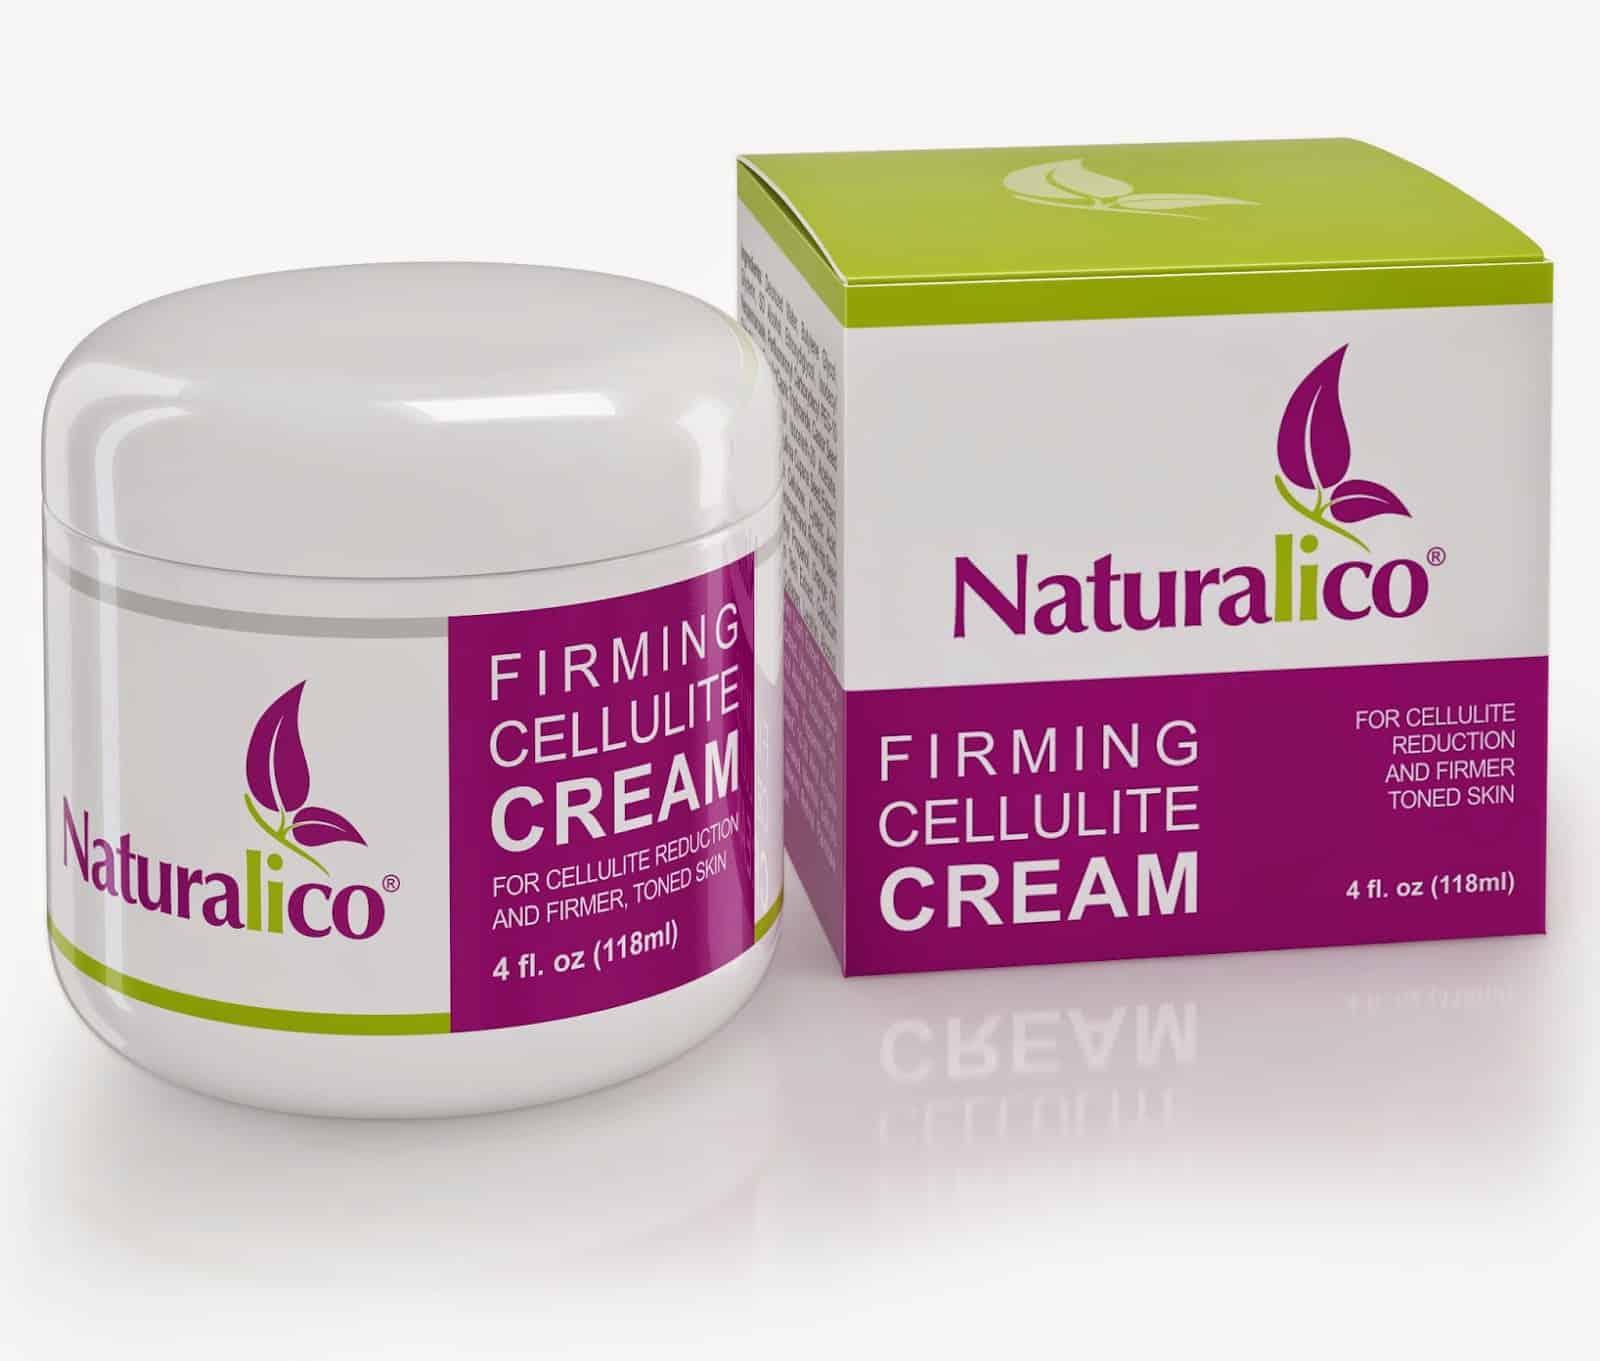 Cellulite with Retinol & Caffeine and Body Firming Cream ...